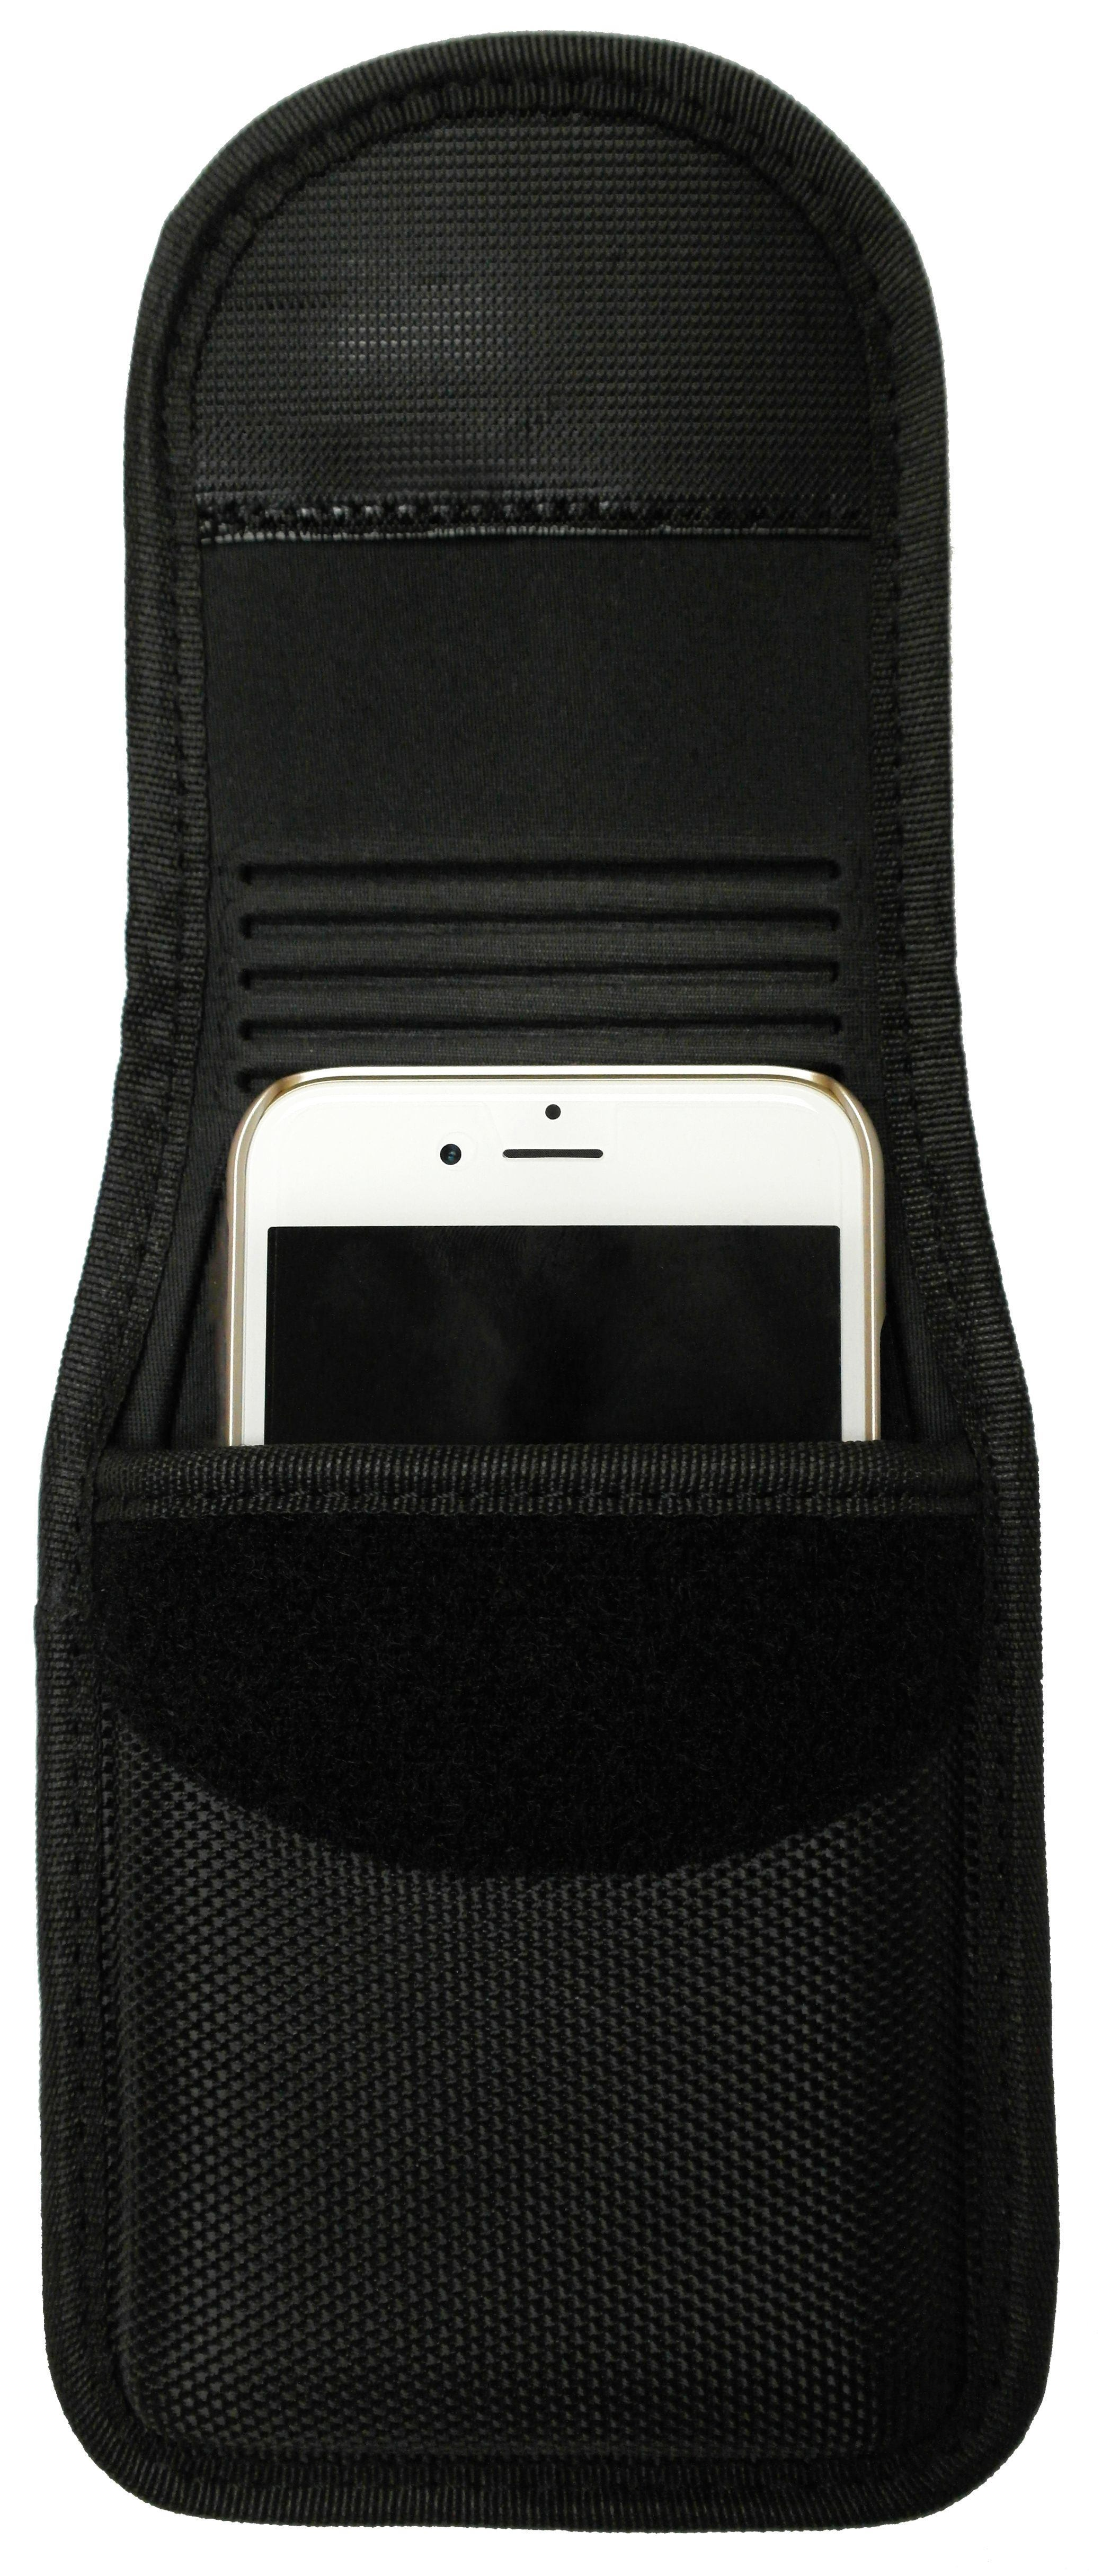 Smart Phone Case, 2XL, iPhone6 & more - Closed - Ballistic-